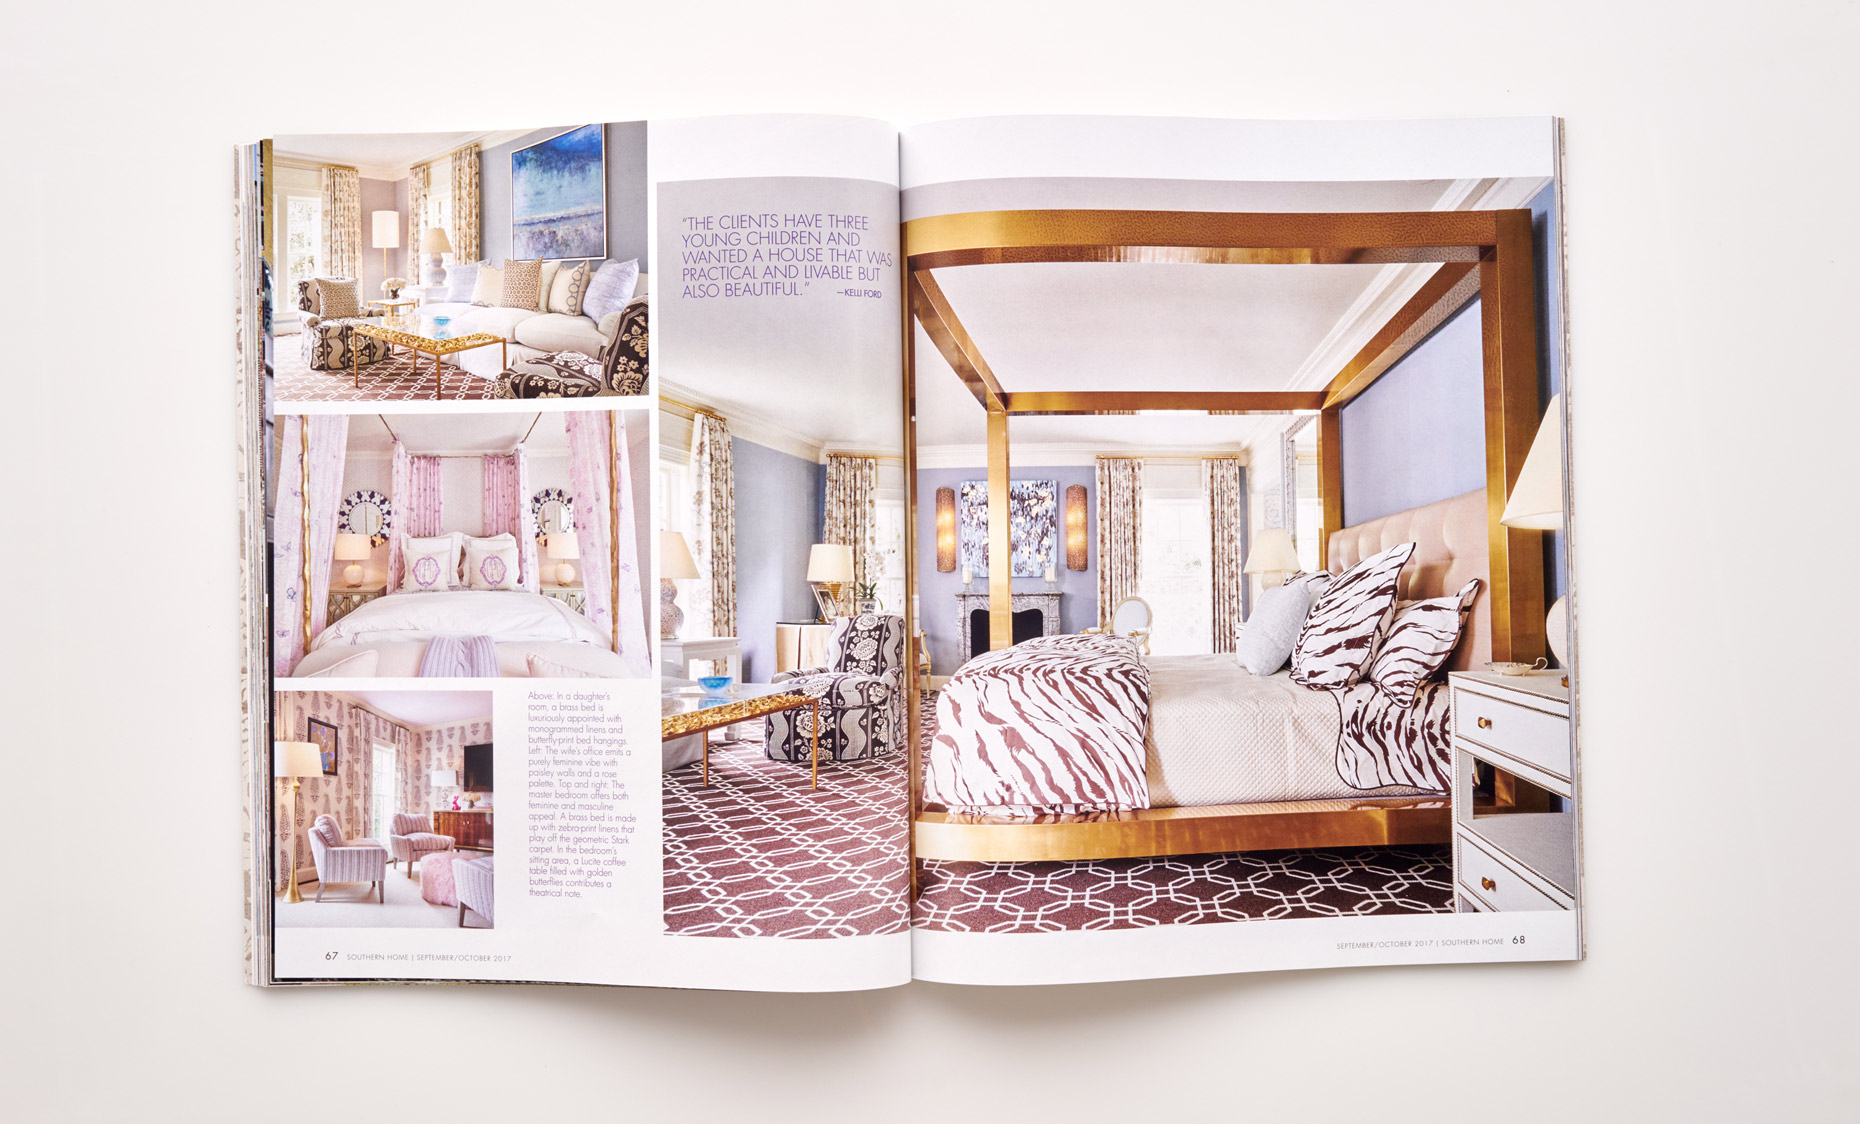 Stephen Karlisch Southern Home Livable Luxury Bedroom